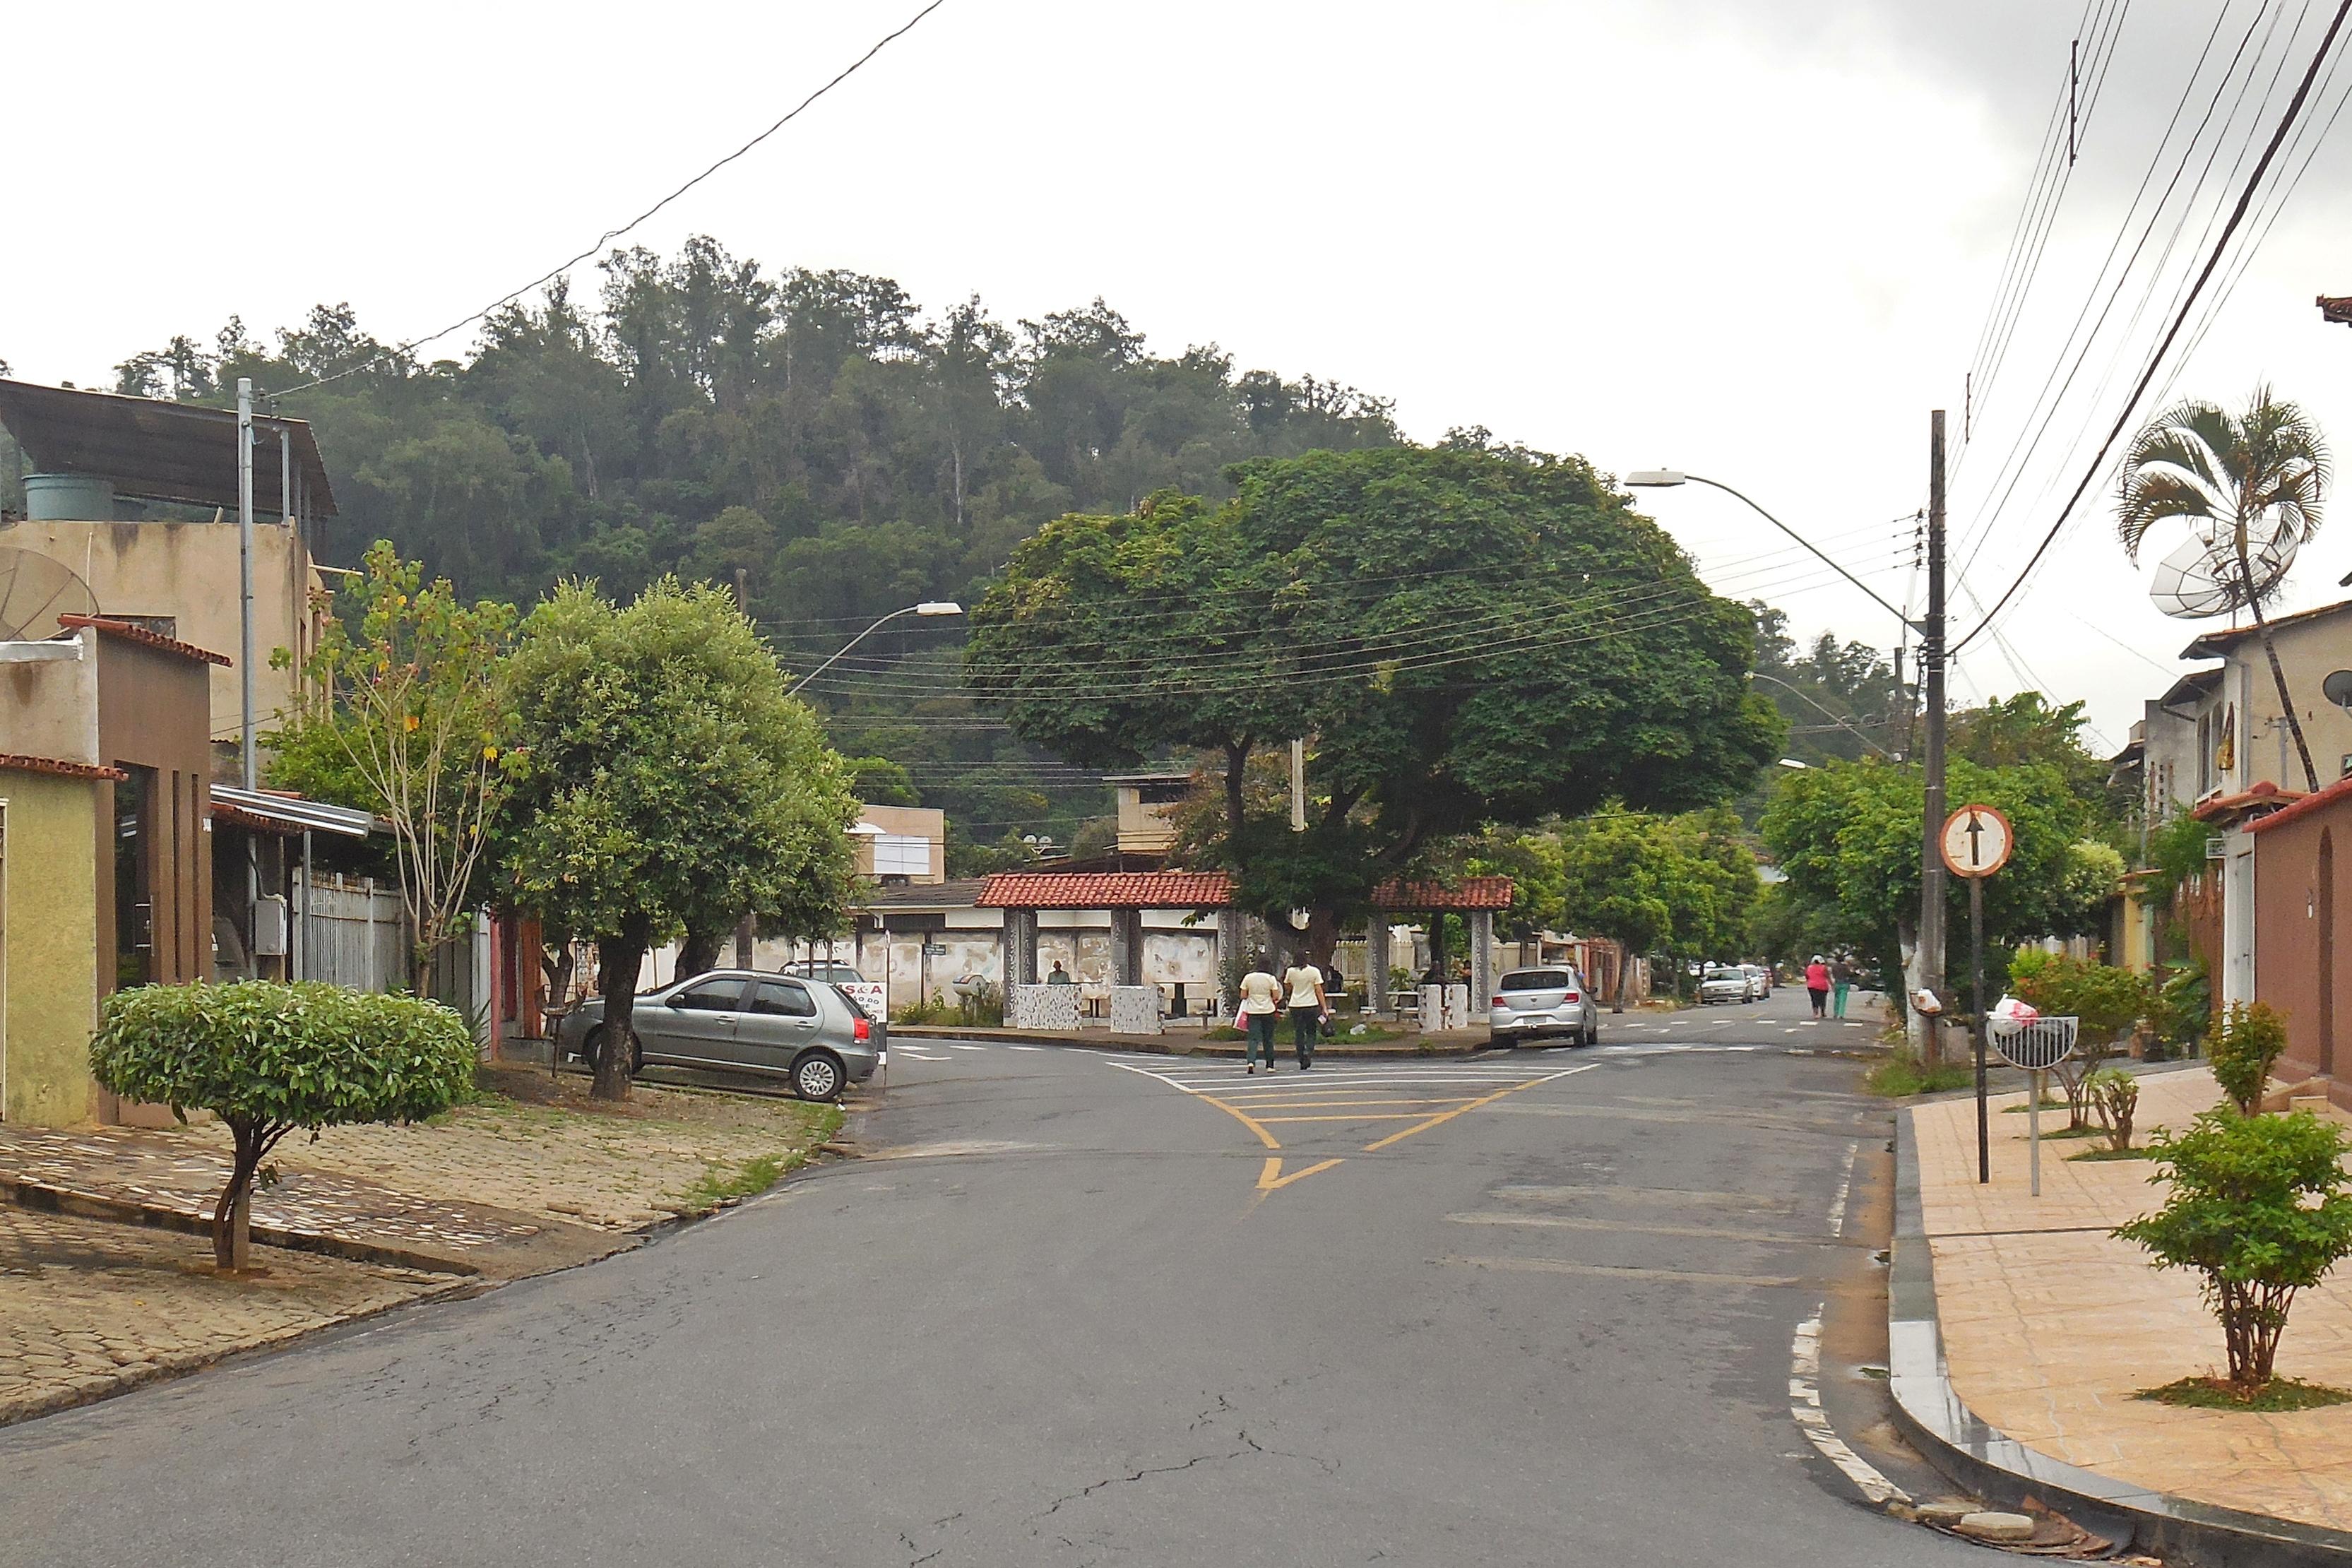 Timóteo Minas Gerais fonte: upload.wikimedia.org